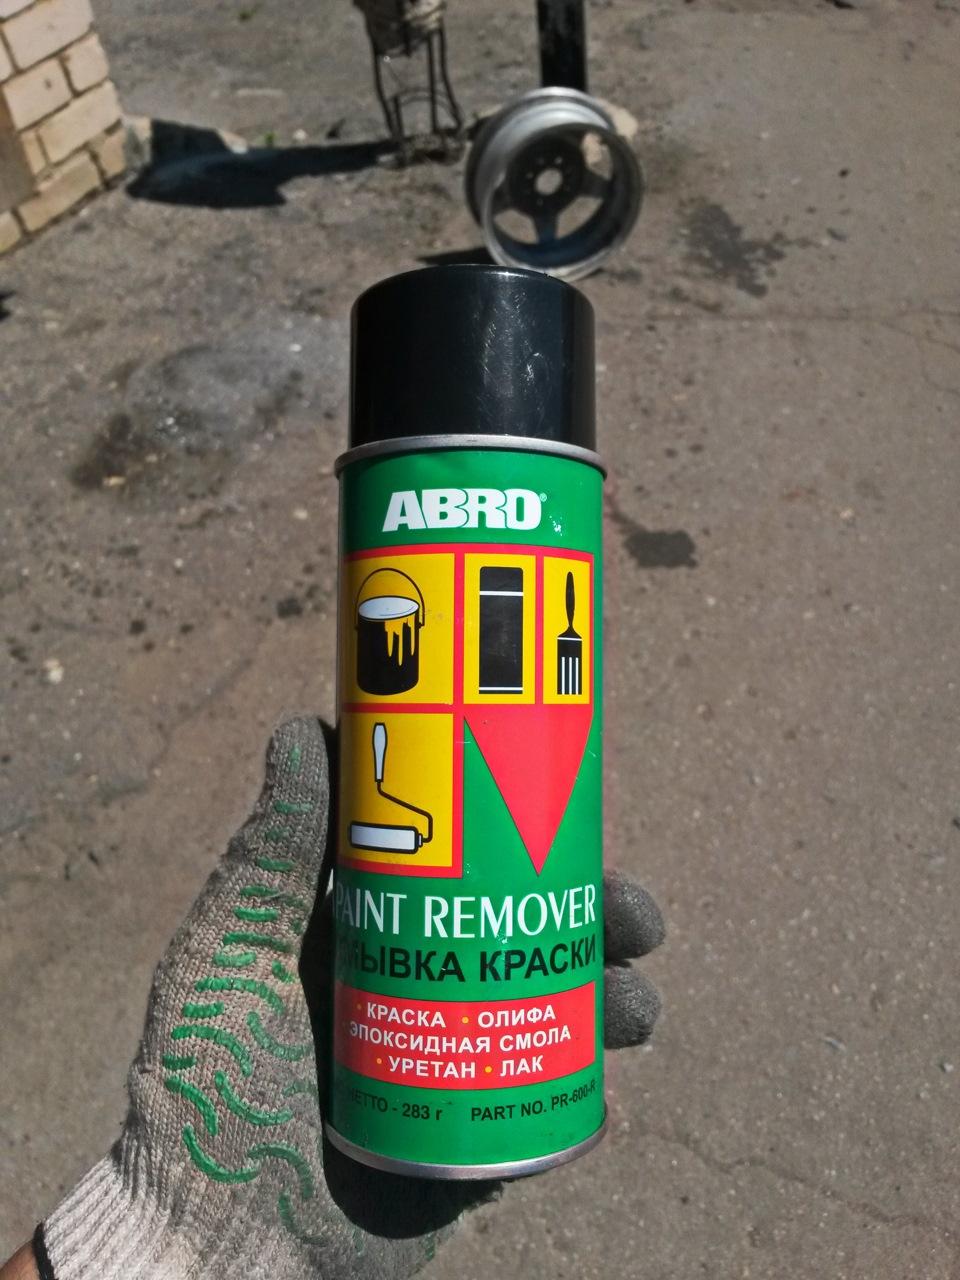 Жидкость для снятия краски с металла своими руками